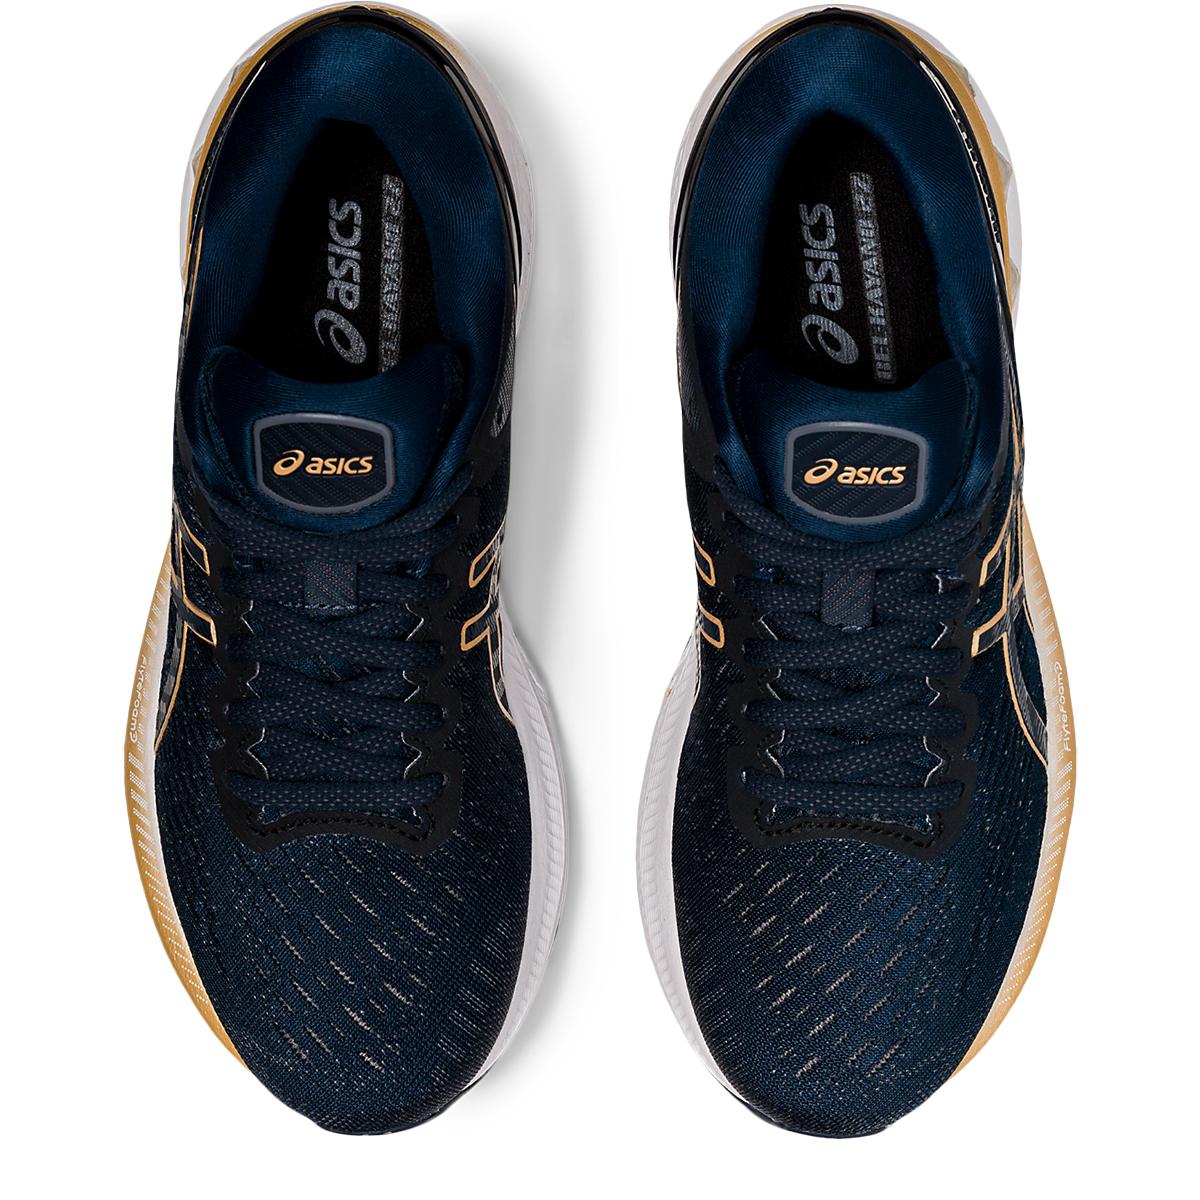 Women's Asics Gel-Kayano 27 Running Shoe - Color: French Blue/Black/Orange - Size: 5 - Width: Regular, French Blue/Black/Orange, large, image 6